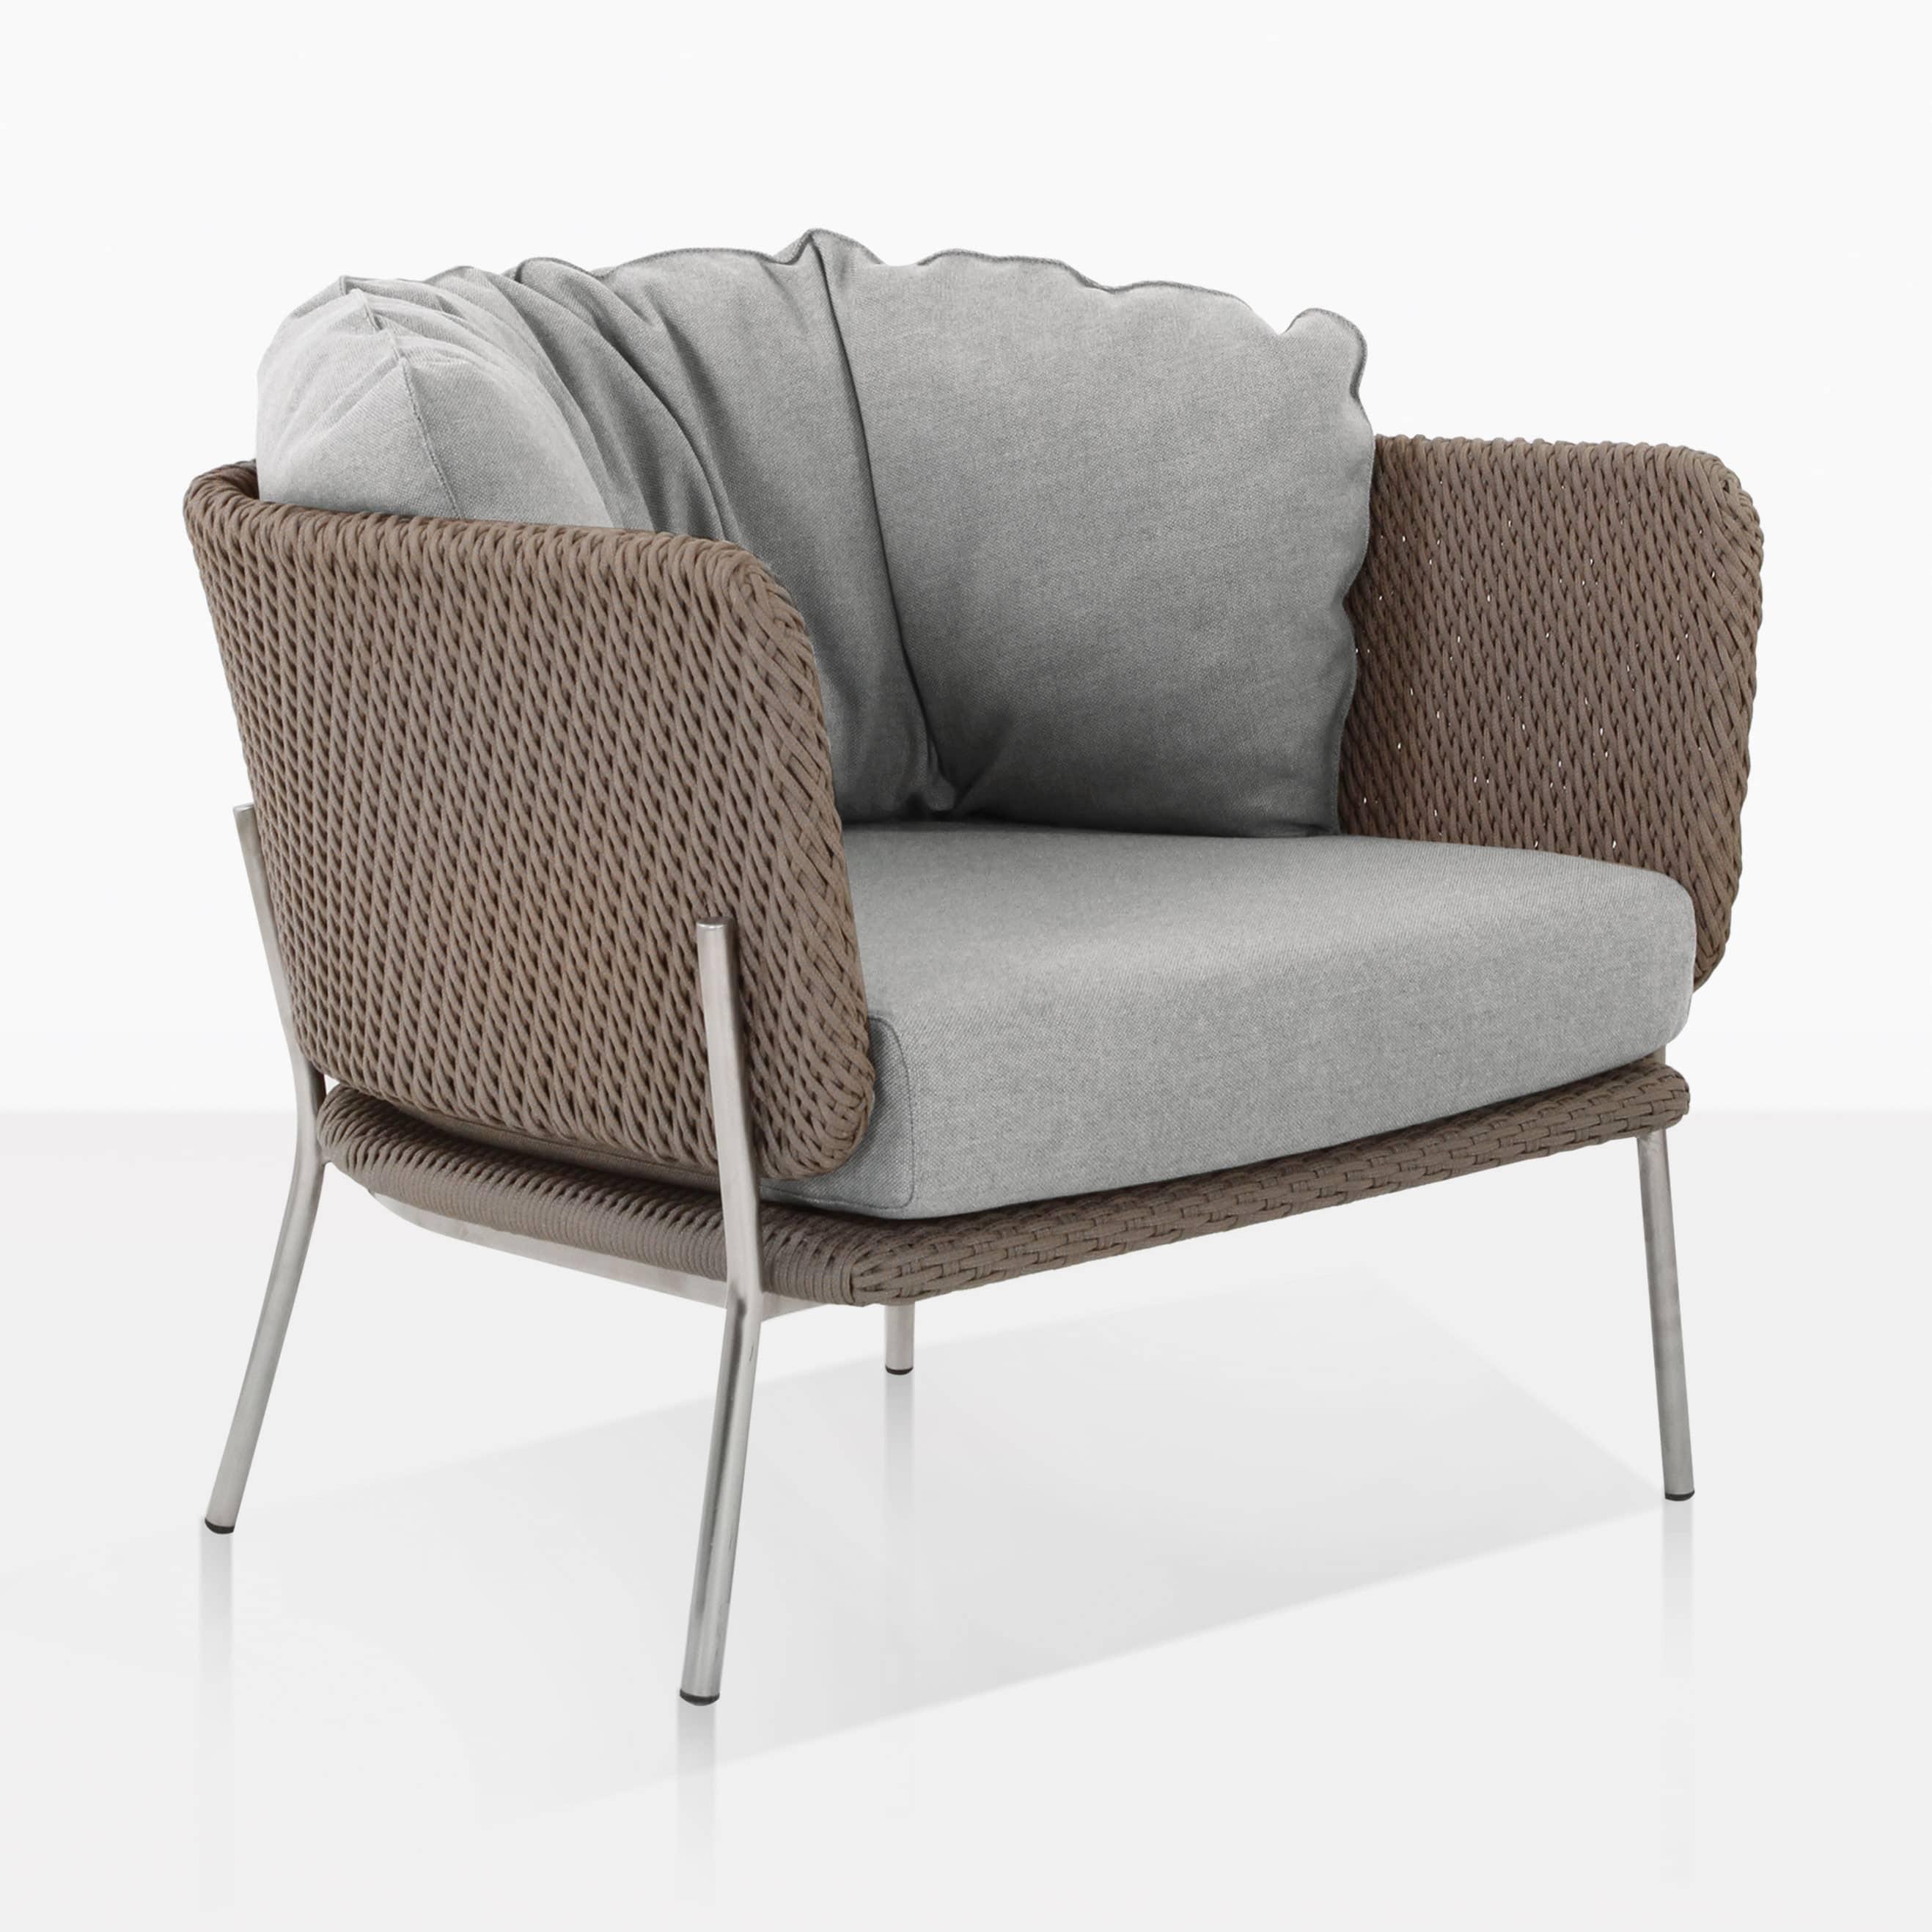 Studio rope relaxing chair cyprus weave in blend fog design warehouse nz